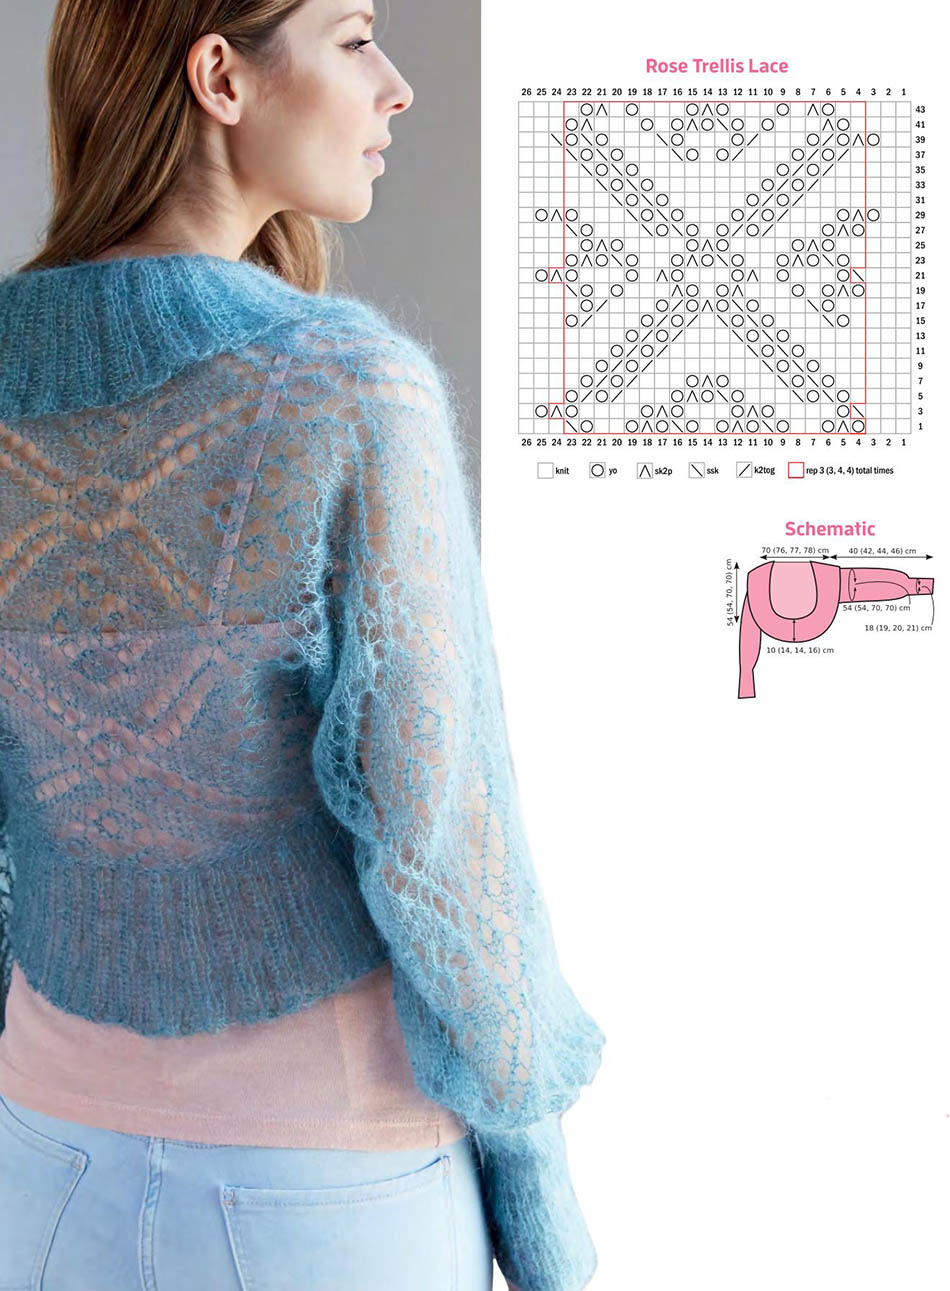 Knitting Patterns For Kid Mohair : Kid mohair-silk lace shrug